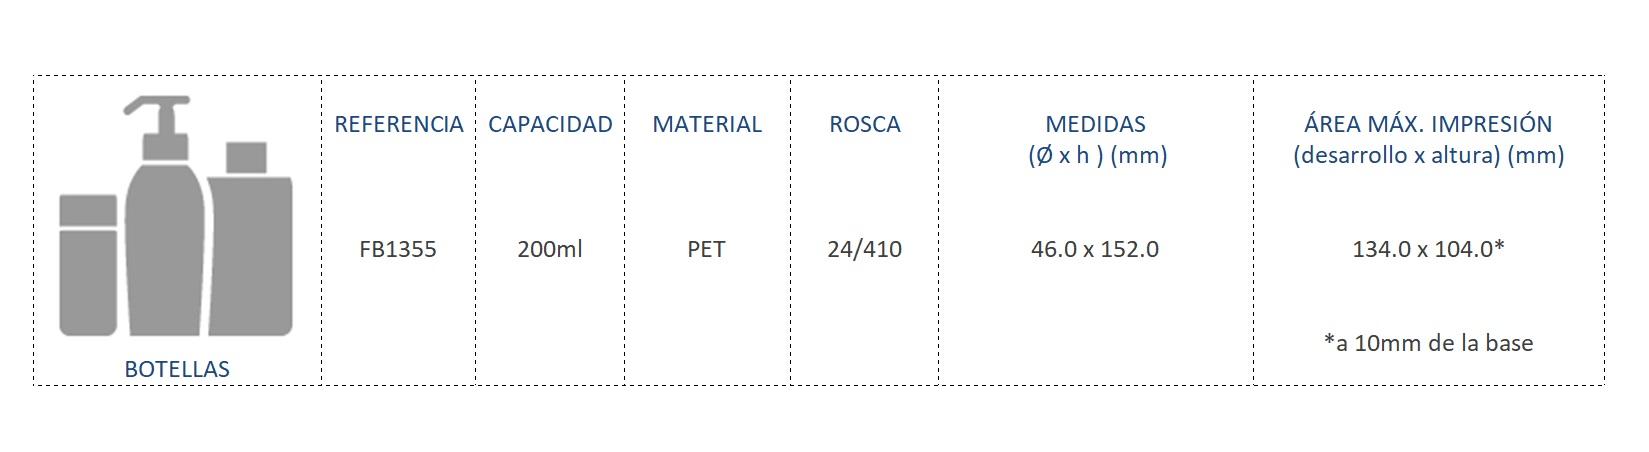 Cuadro de materiales botella FB1355